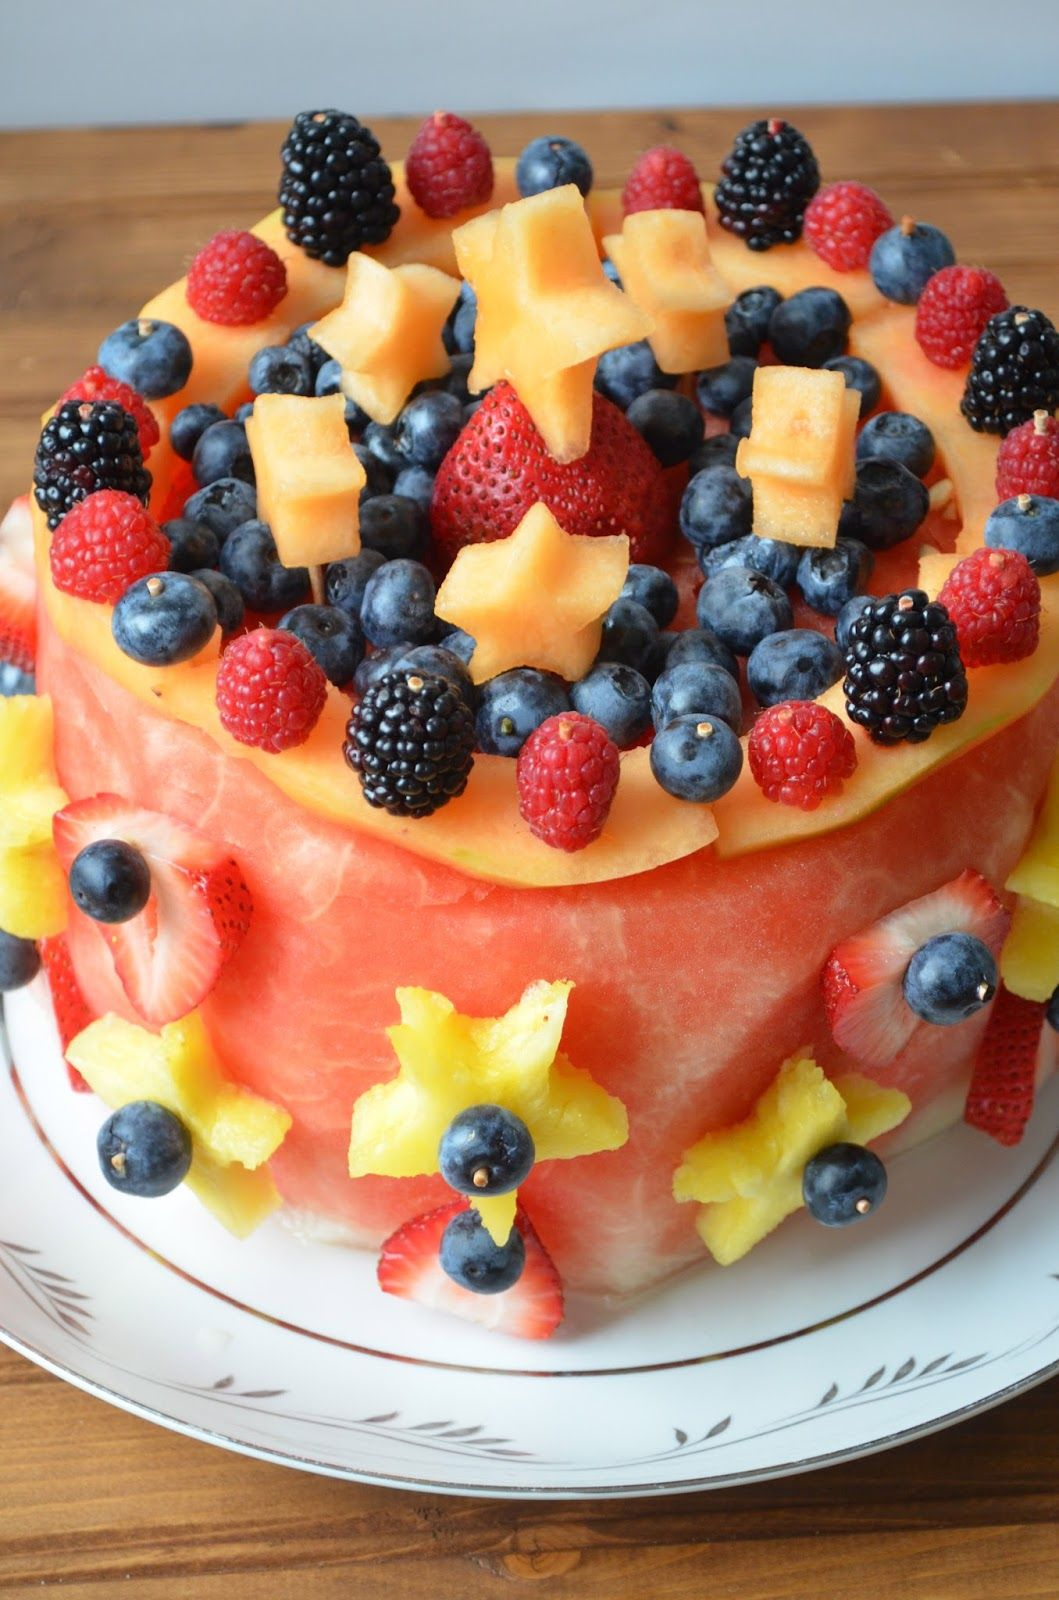 The Savvy Kitchen Raw Fruit Cake For My Birthday